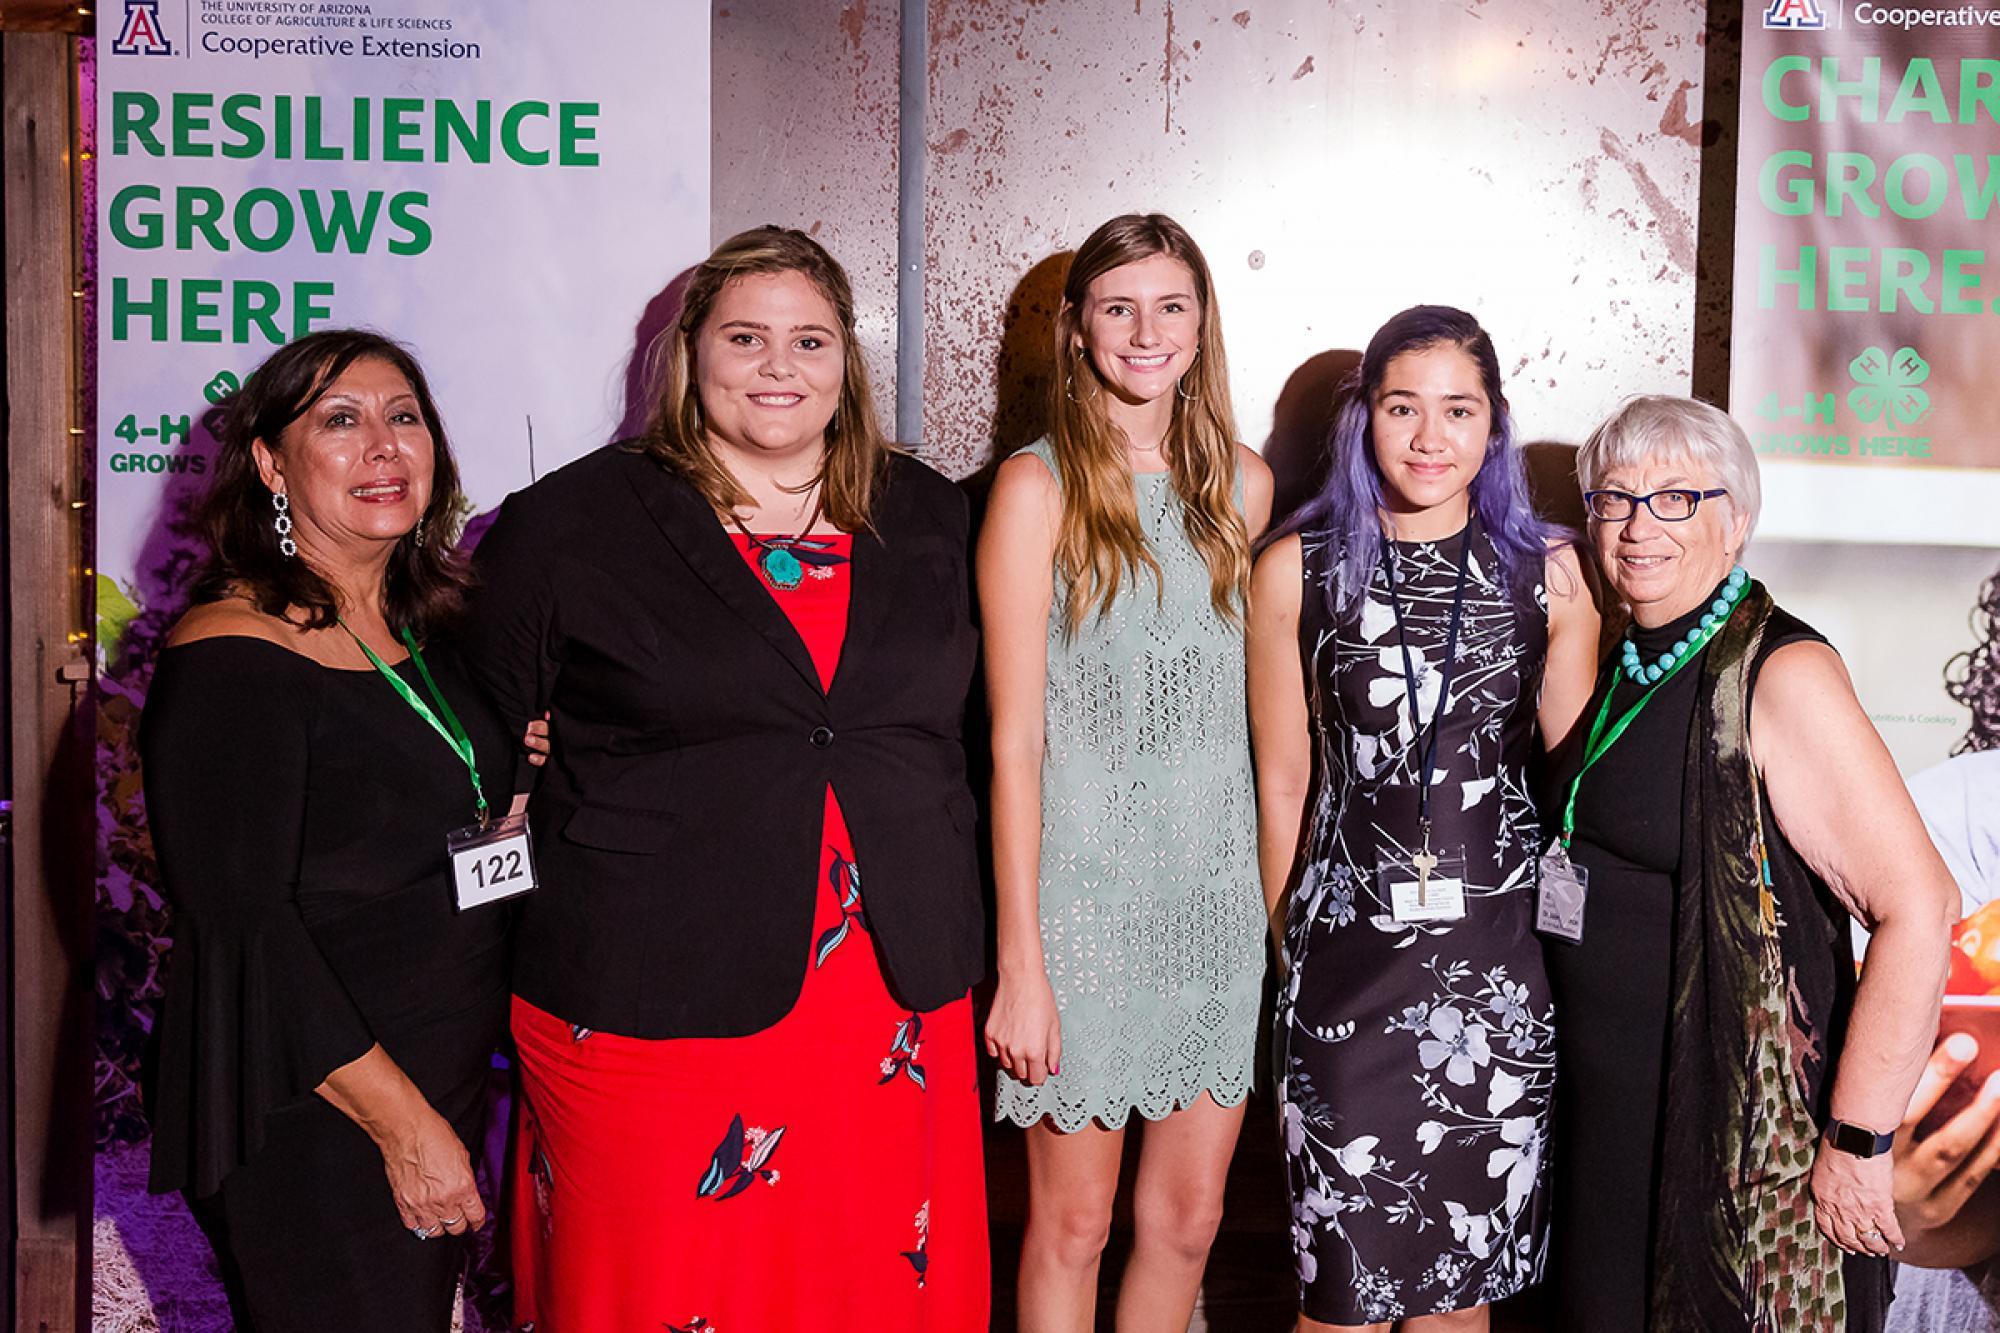 From left: 4-H Foundation Board Member Juanita Waits, scholarship recipients Elizabeth McGibbon, Autumn Gilbert and Robin Lee, and 4-H Foundation President Julie Adamcin.